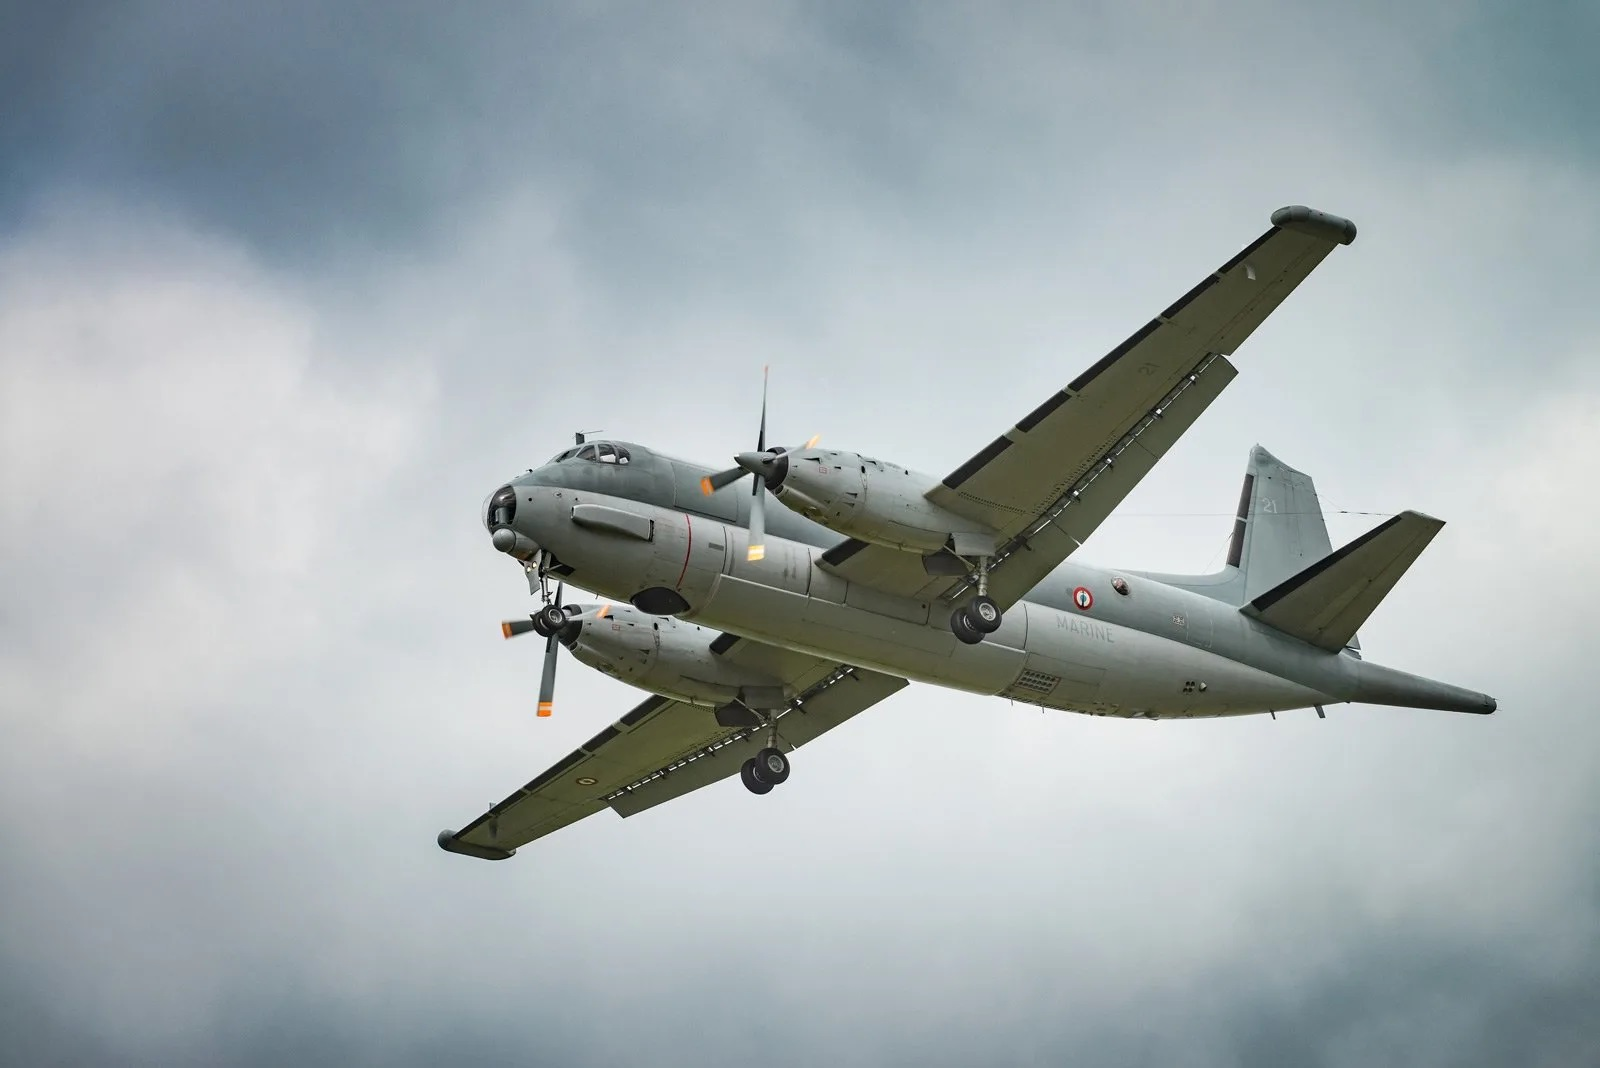 French Navy Receives Upgraded Atlantique 2 (ATL2) Long-range Maritime Patrol Aircraft